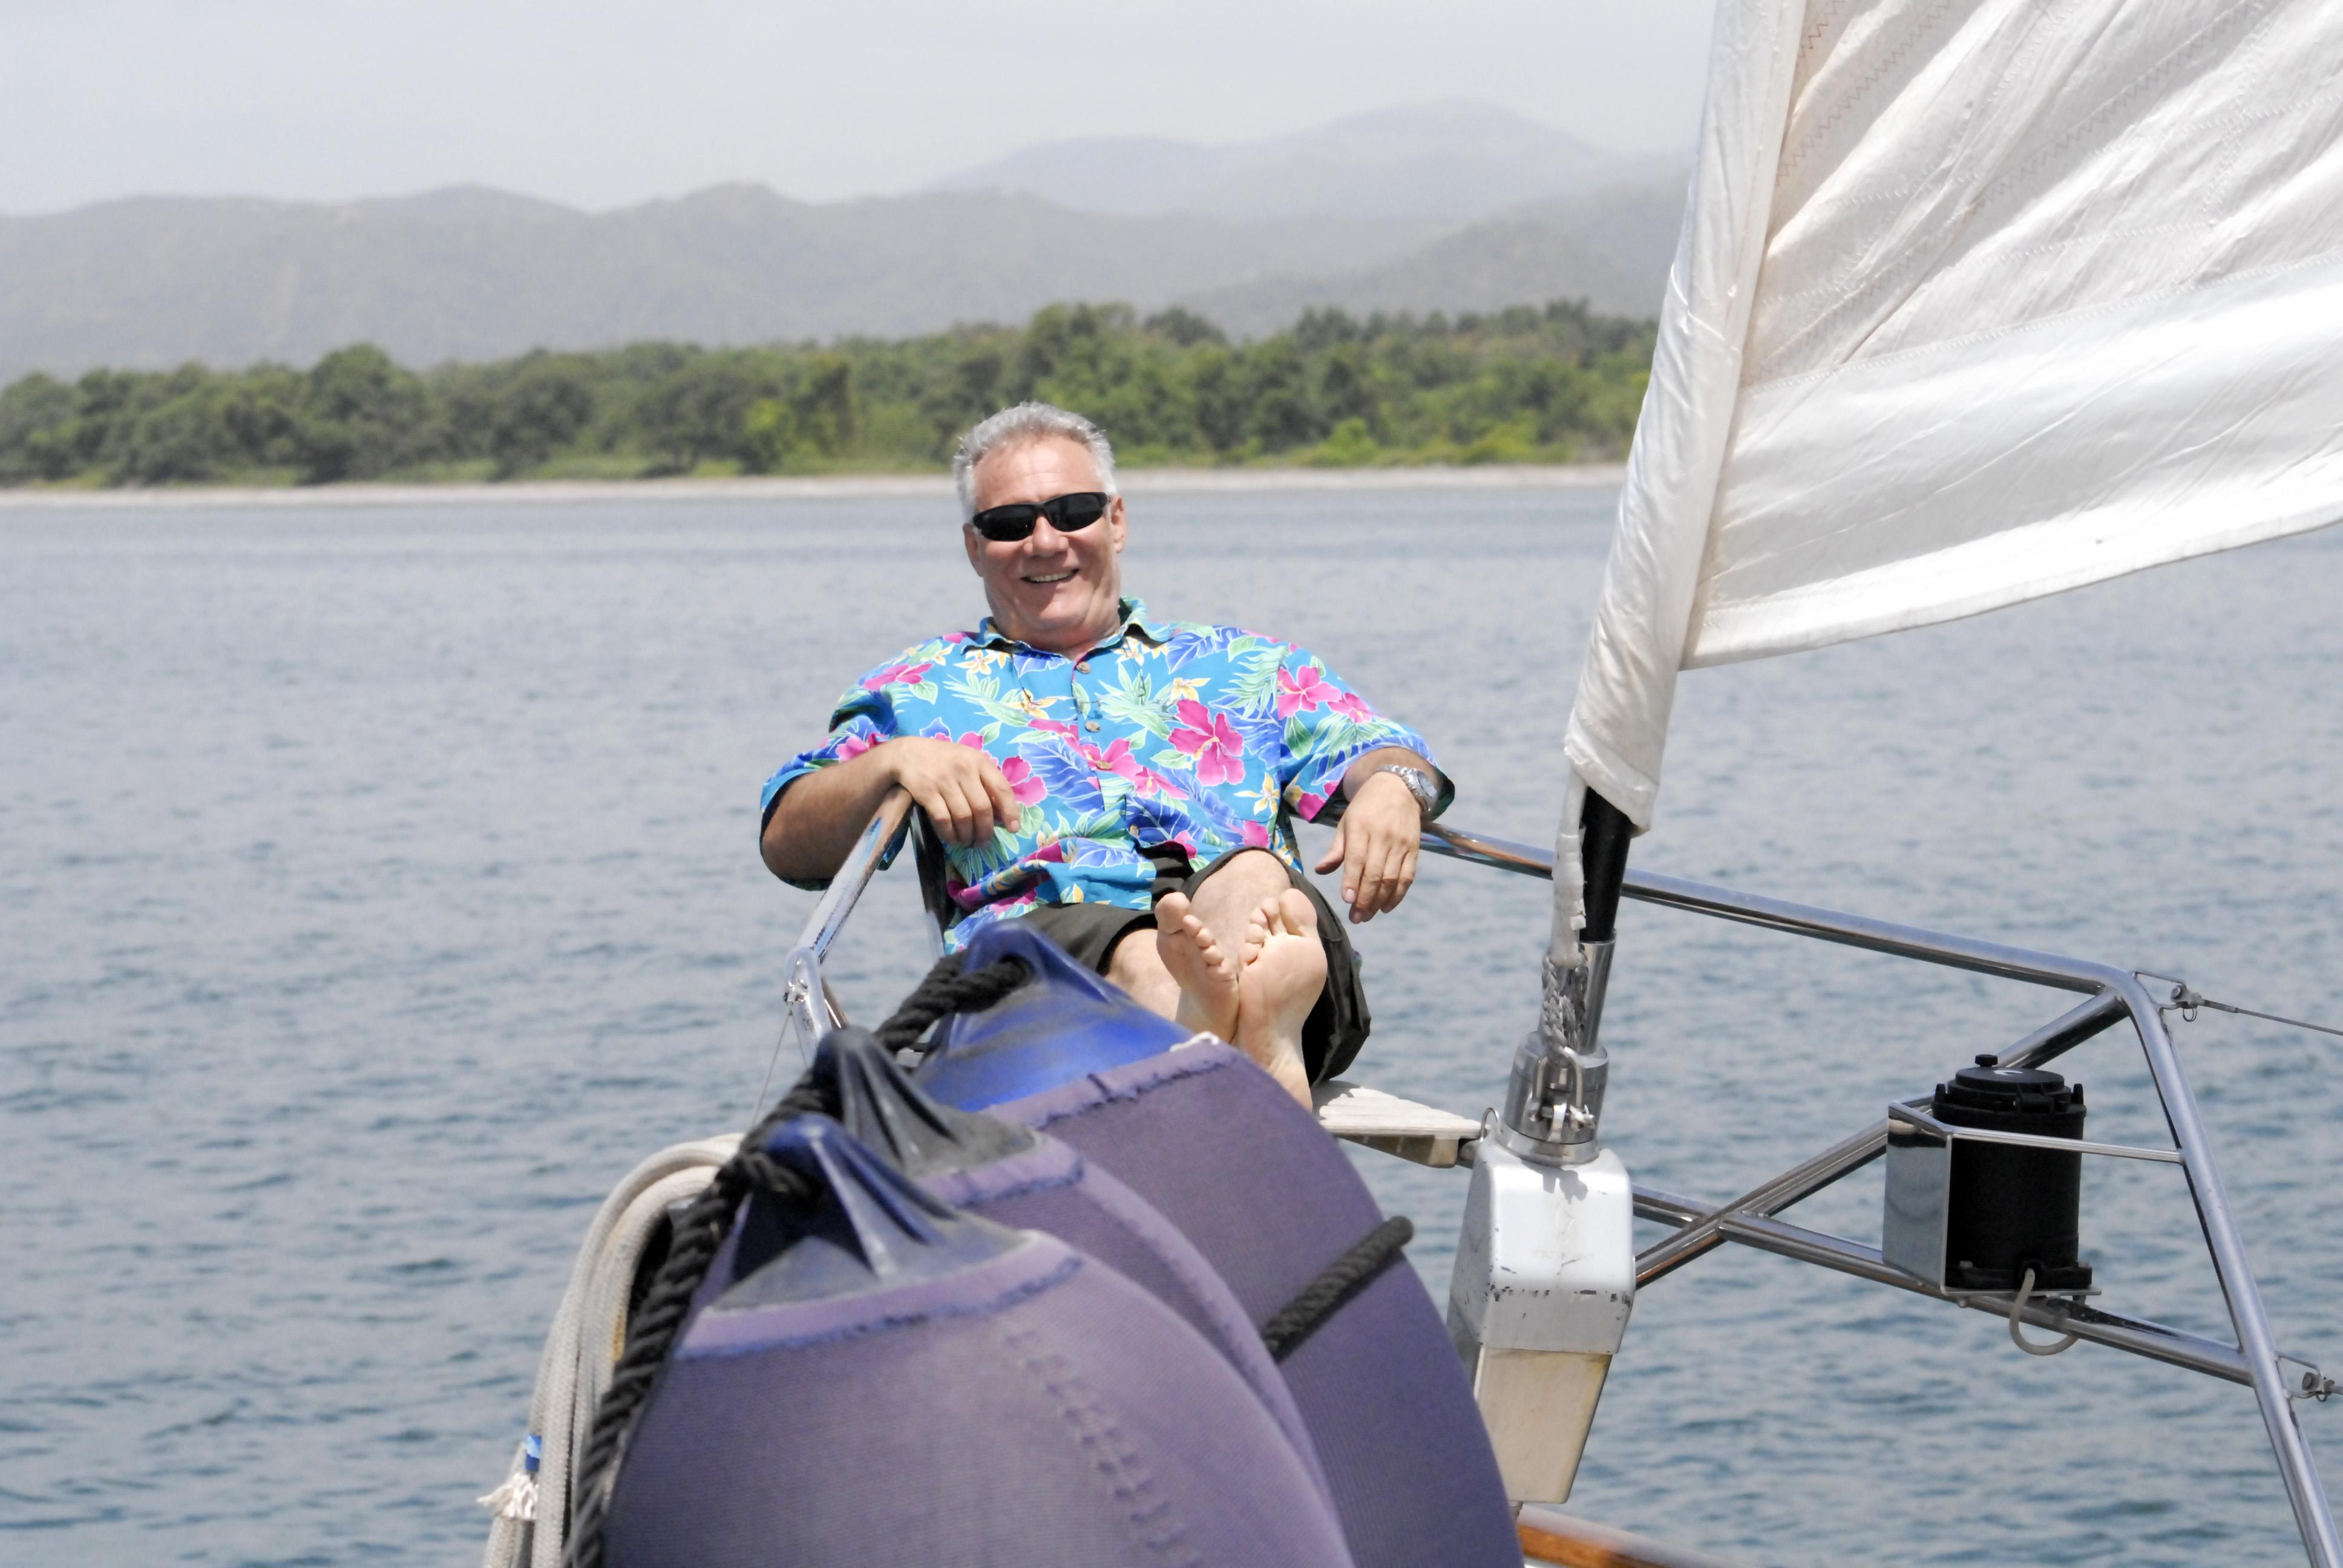 yacht charter questio